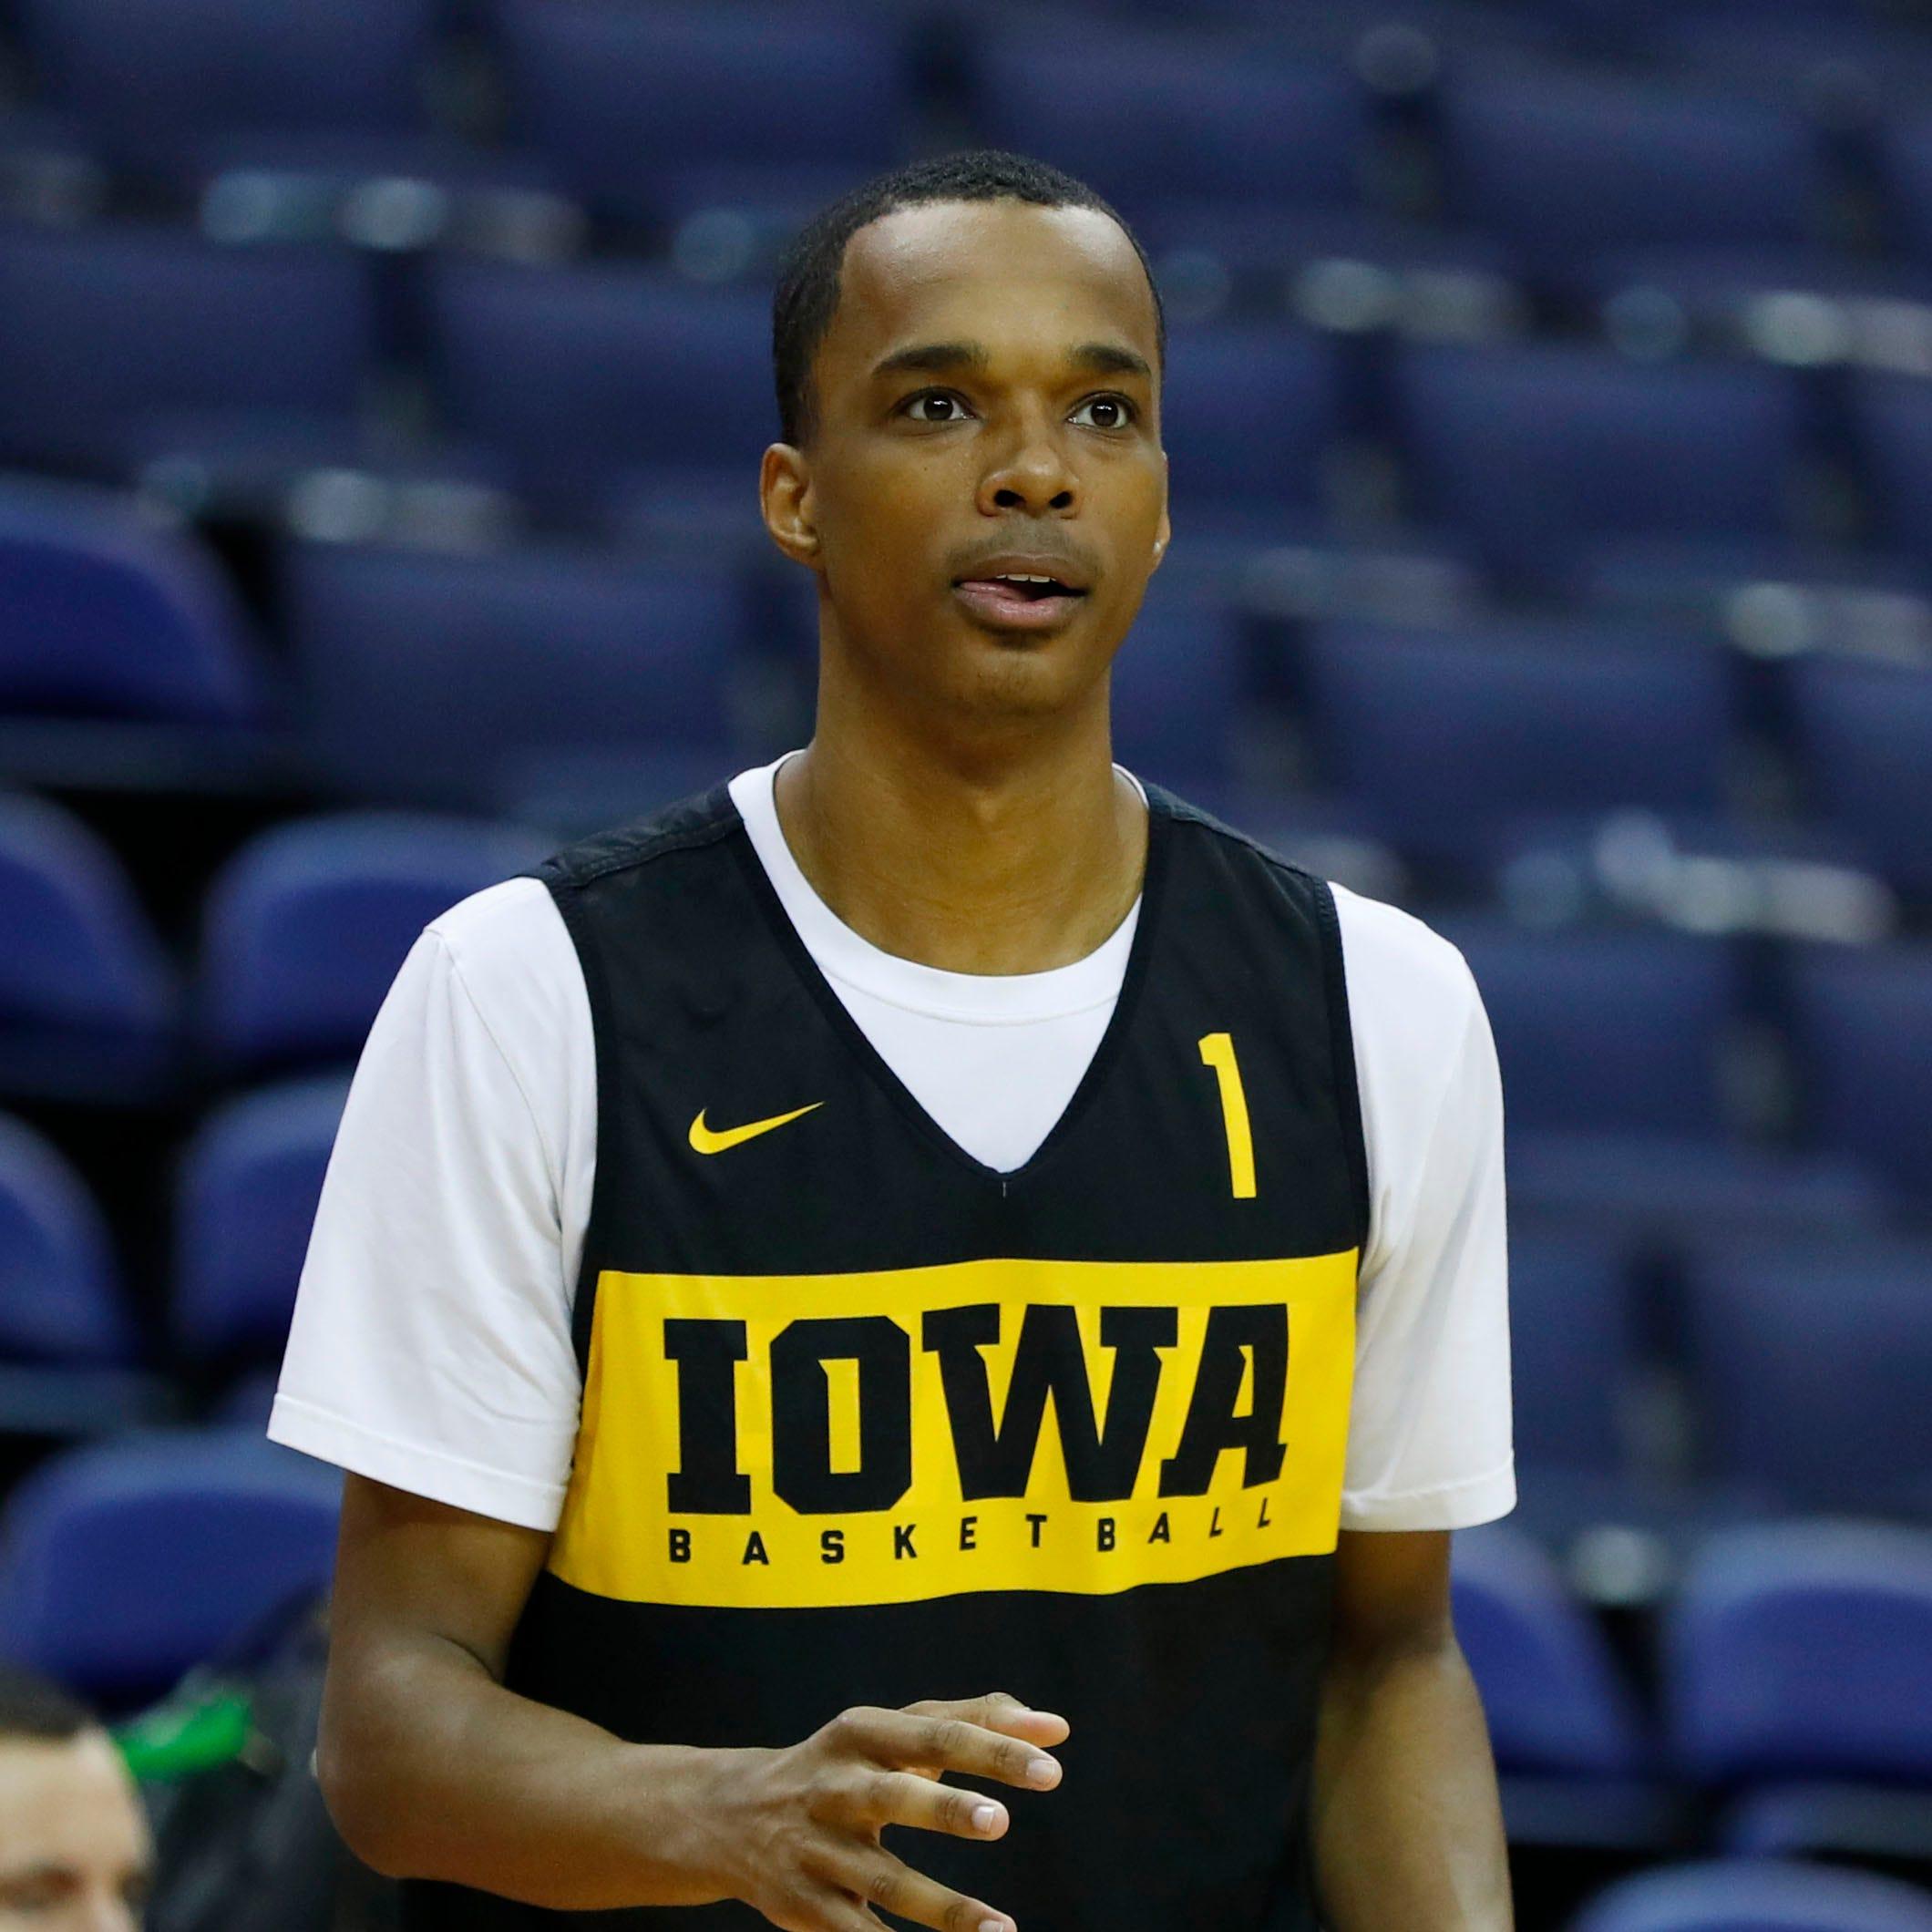 Junior guard Maishe Dailey will transfer from Iowa basketball team